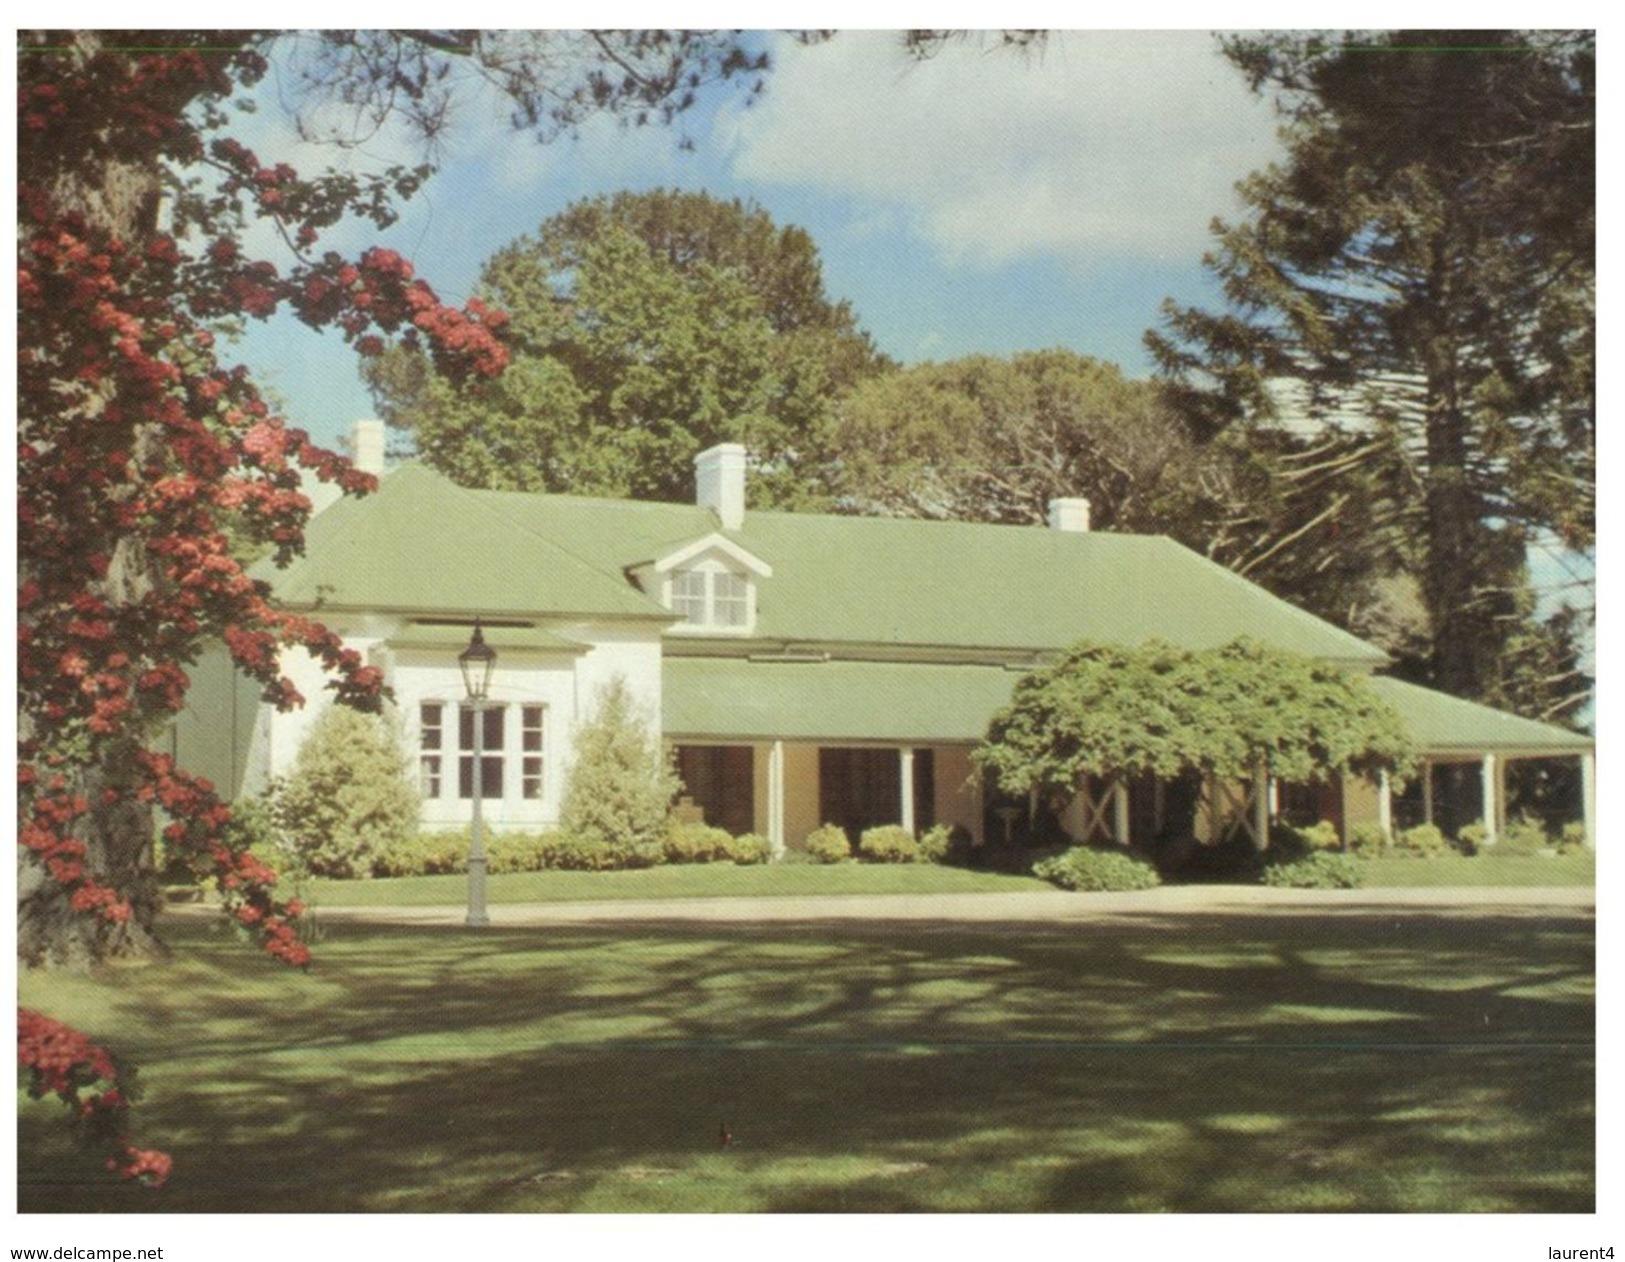 (294) Australia - ACT - Lanyon Homestead - Canberra (ACT)